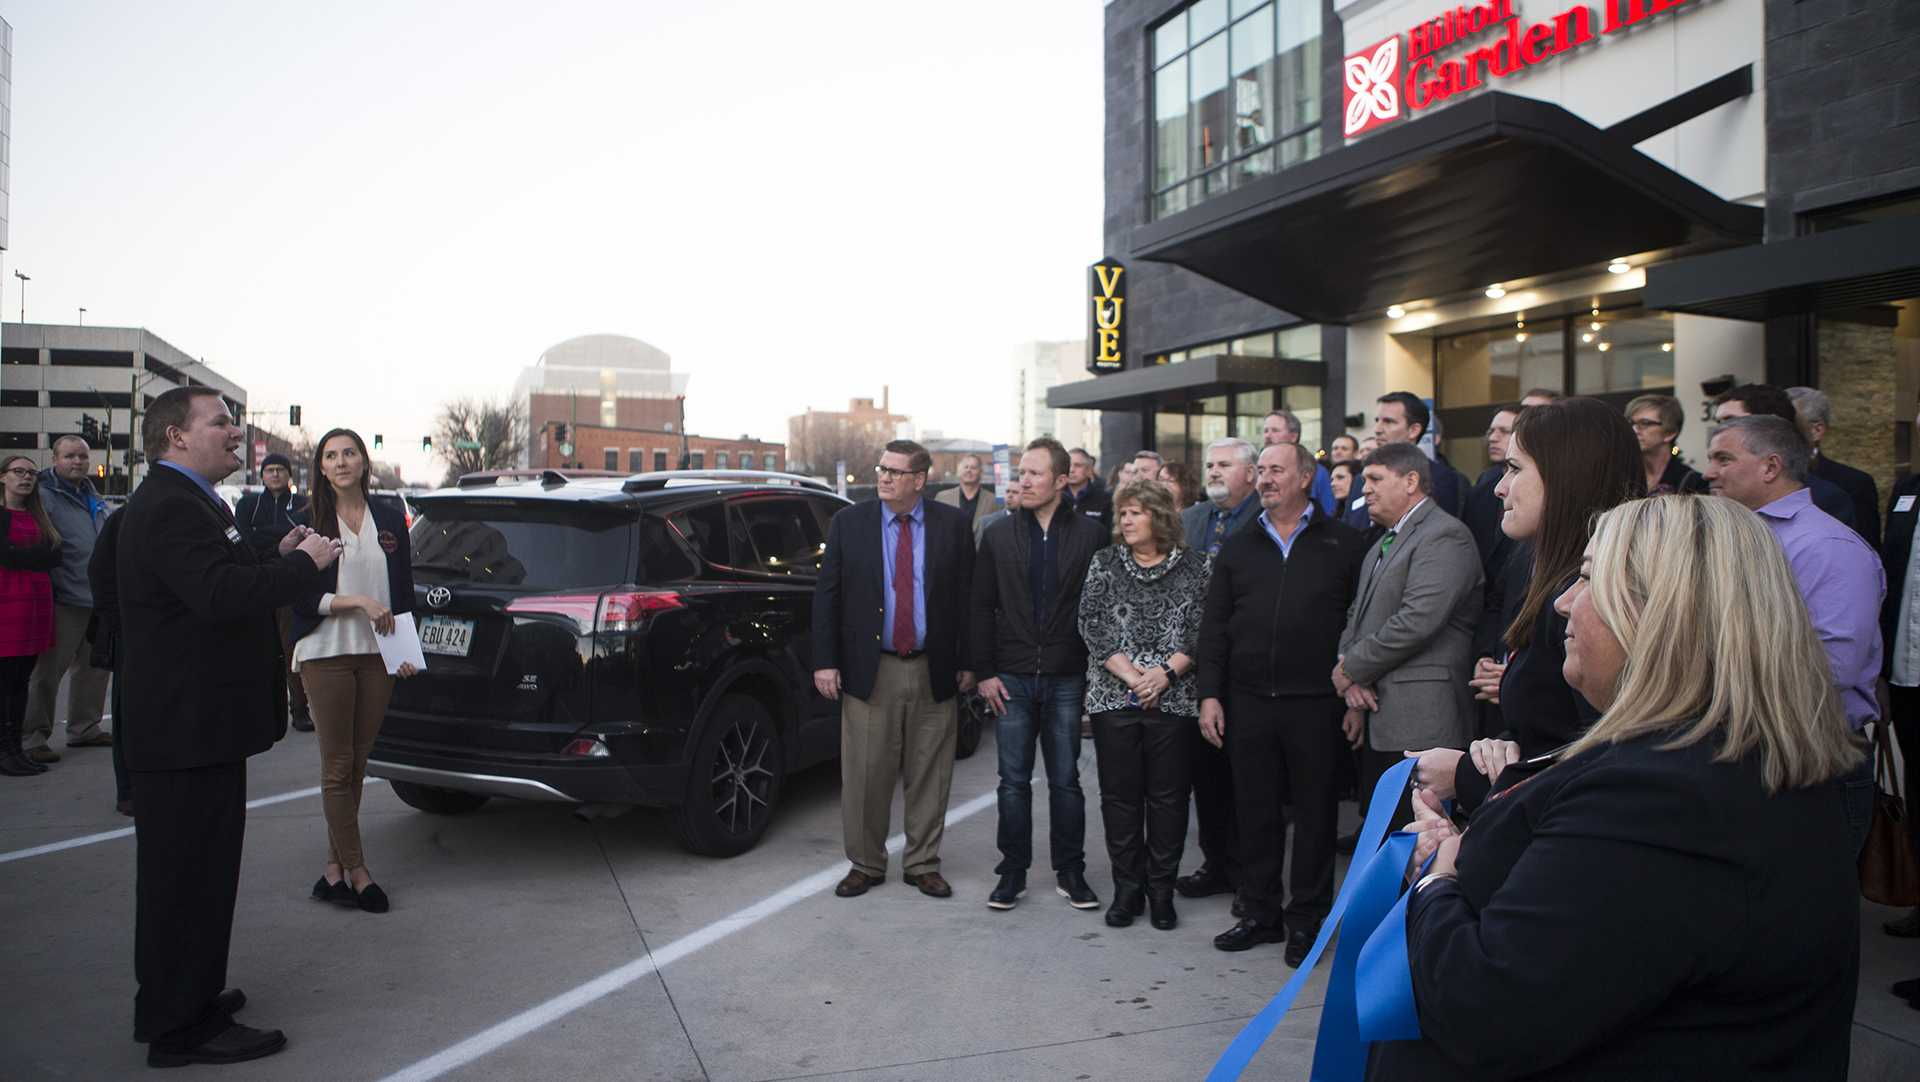 Ribbon-cutting ceremony marks Iowa City's new Hilton Garden Inn's opening